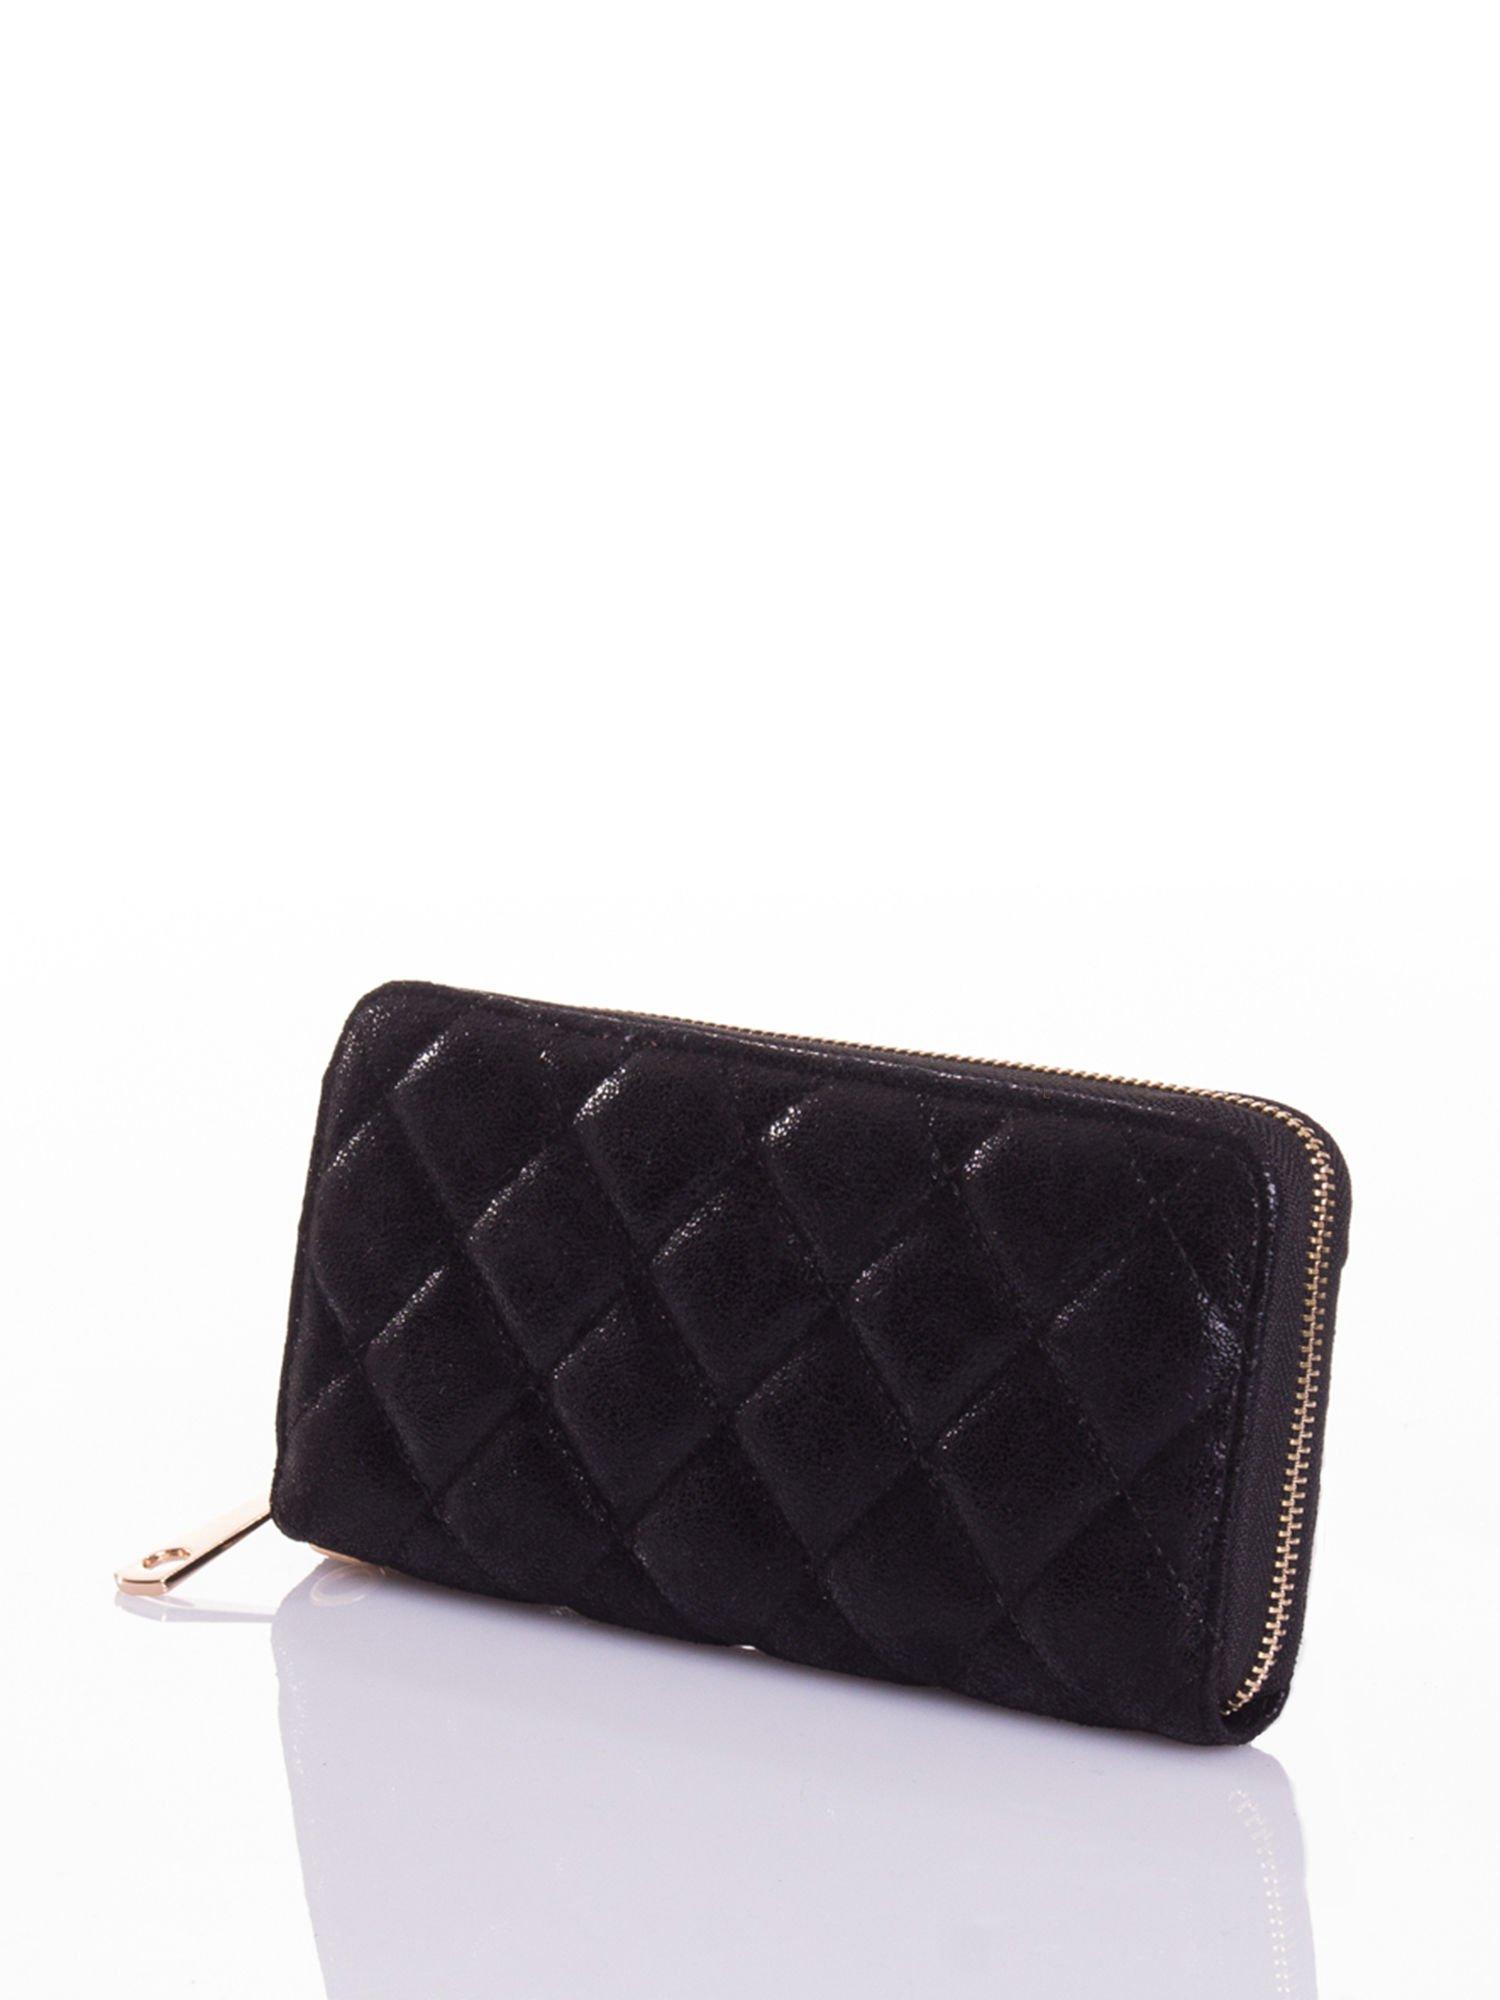 Czarny pikowany portfel                                  zdj.                                  2